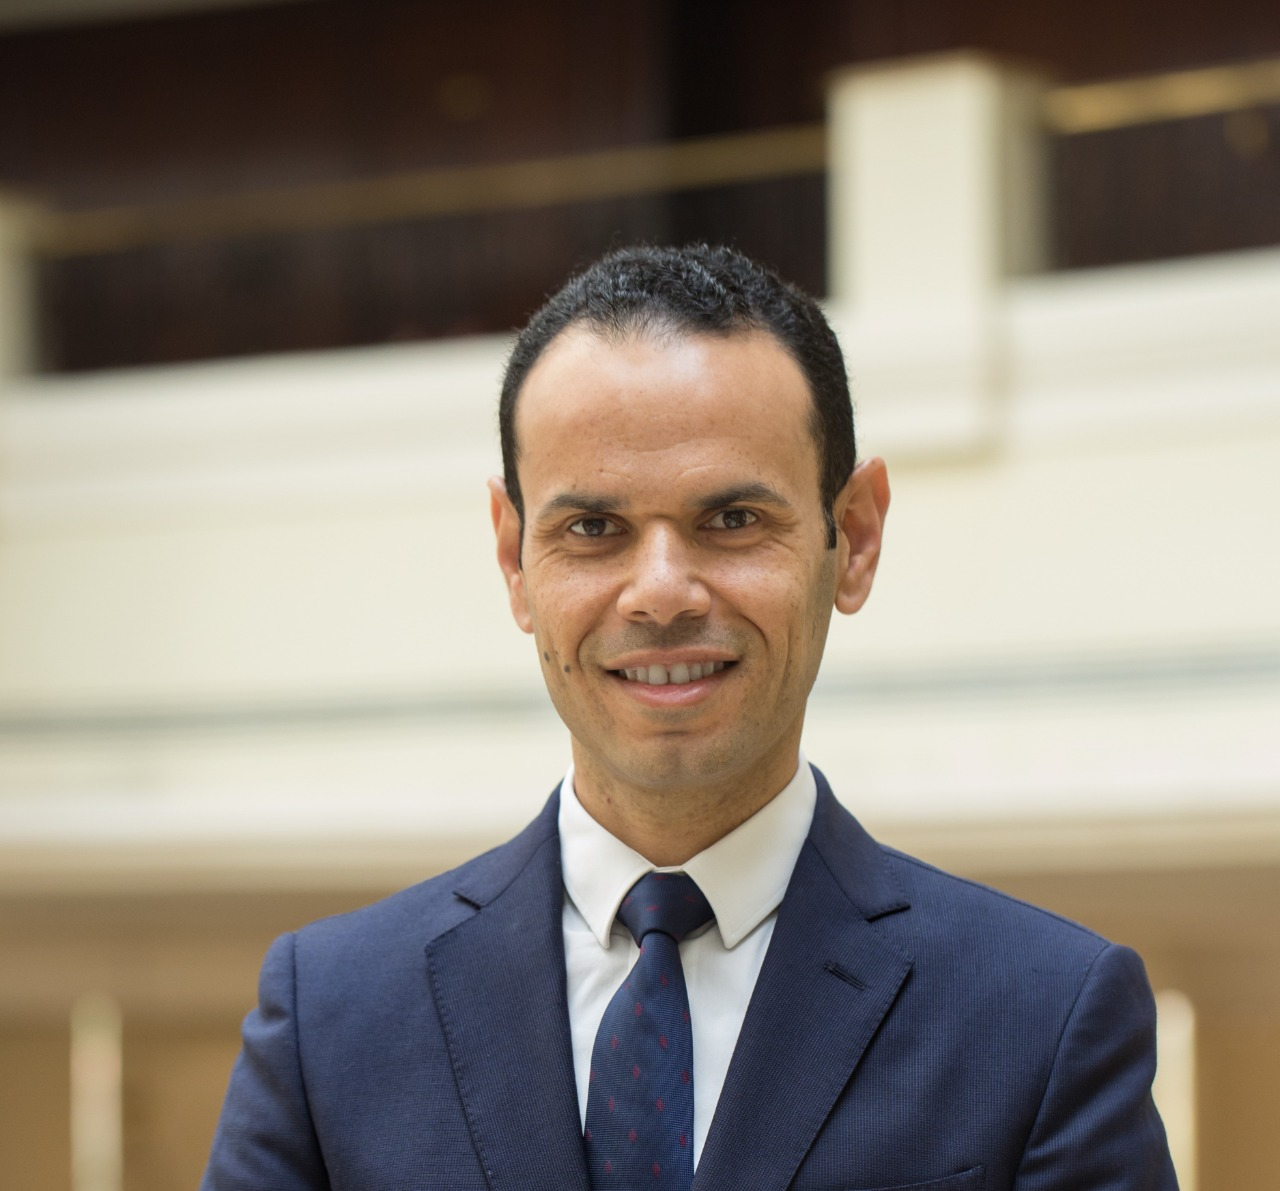 Mohamed Hany El-Assal